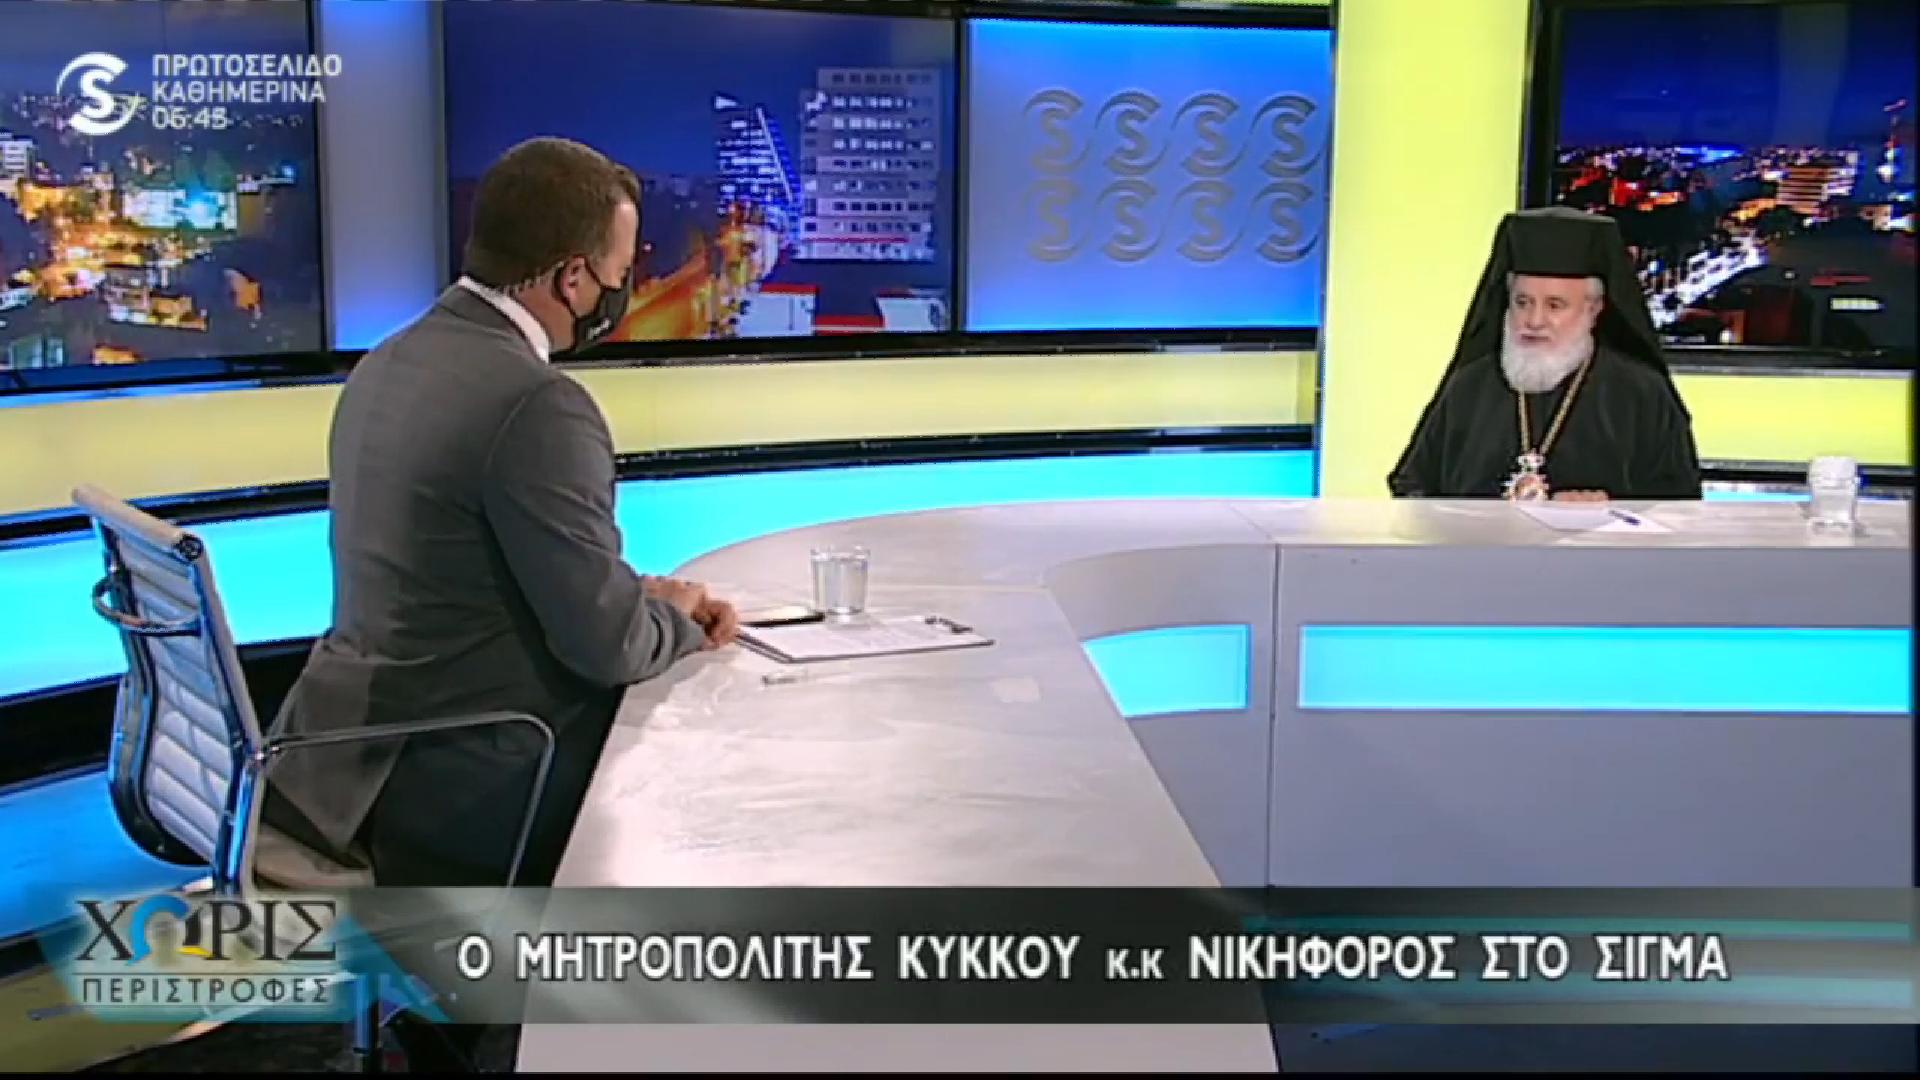 You are currently viewing «Απειλητικός» ο Κύκκου στη συνέντευξη του: «Θα μνημονεύω τον αρχιεπίσκοπο Κύπρου όσο δεν συλλειτουργεί με τον Επιφάνιο»